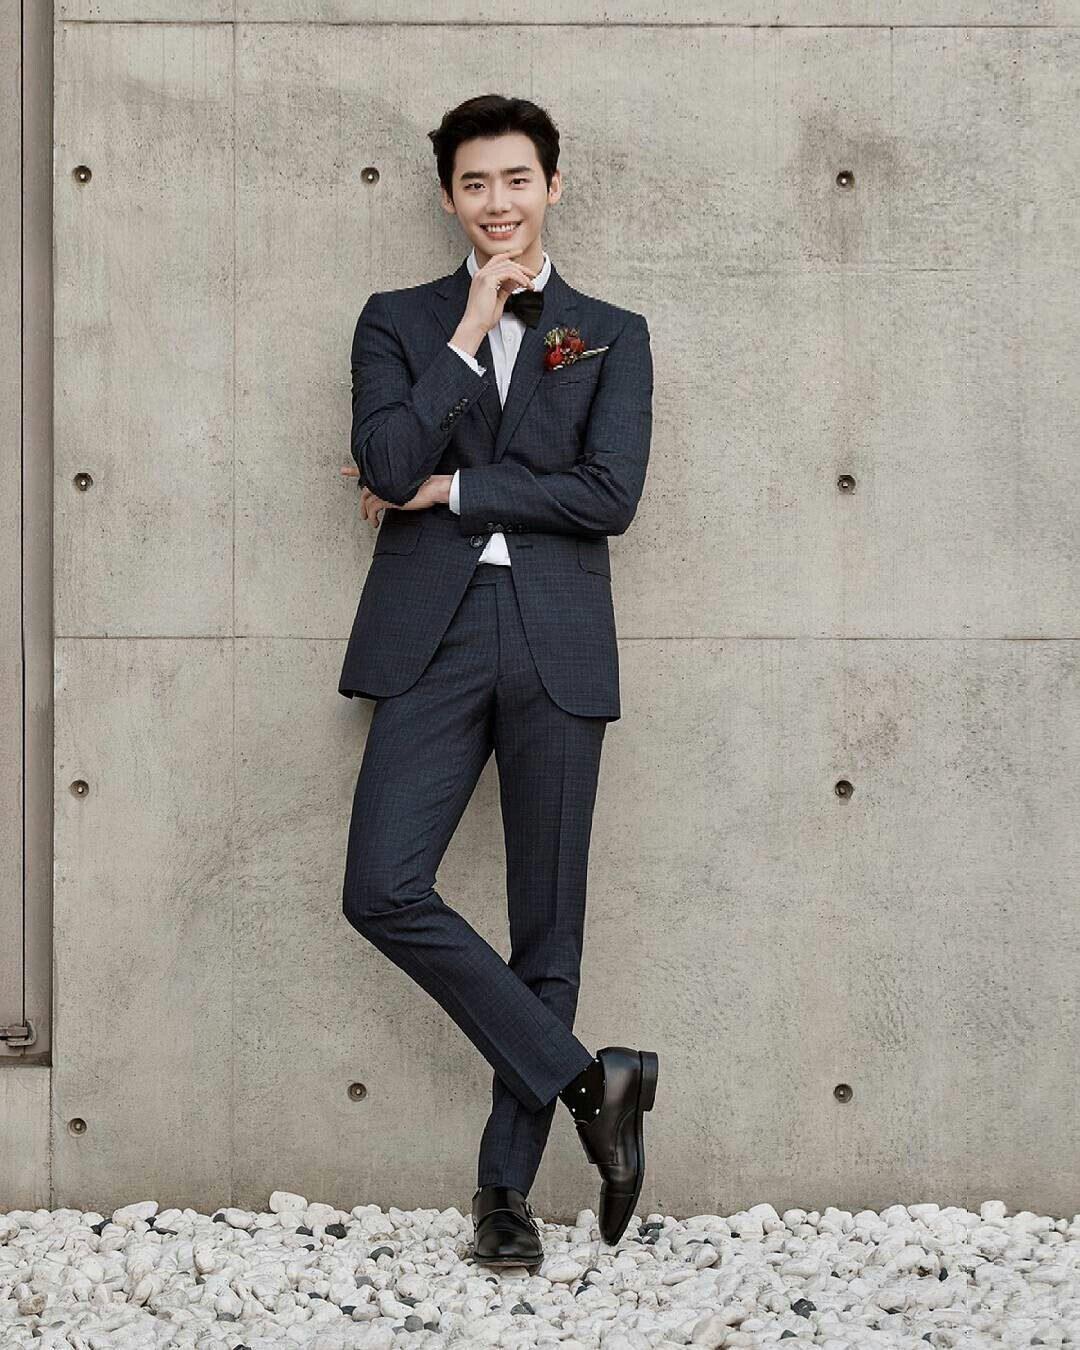 Segera ke Indonesia, Ini Dia 7 Fakta Aktor Hits Korea Lee Jong Suk